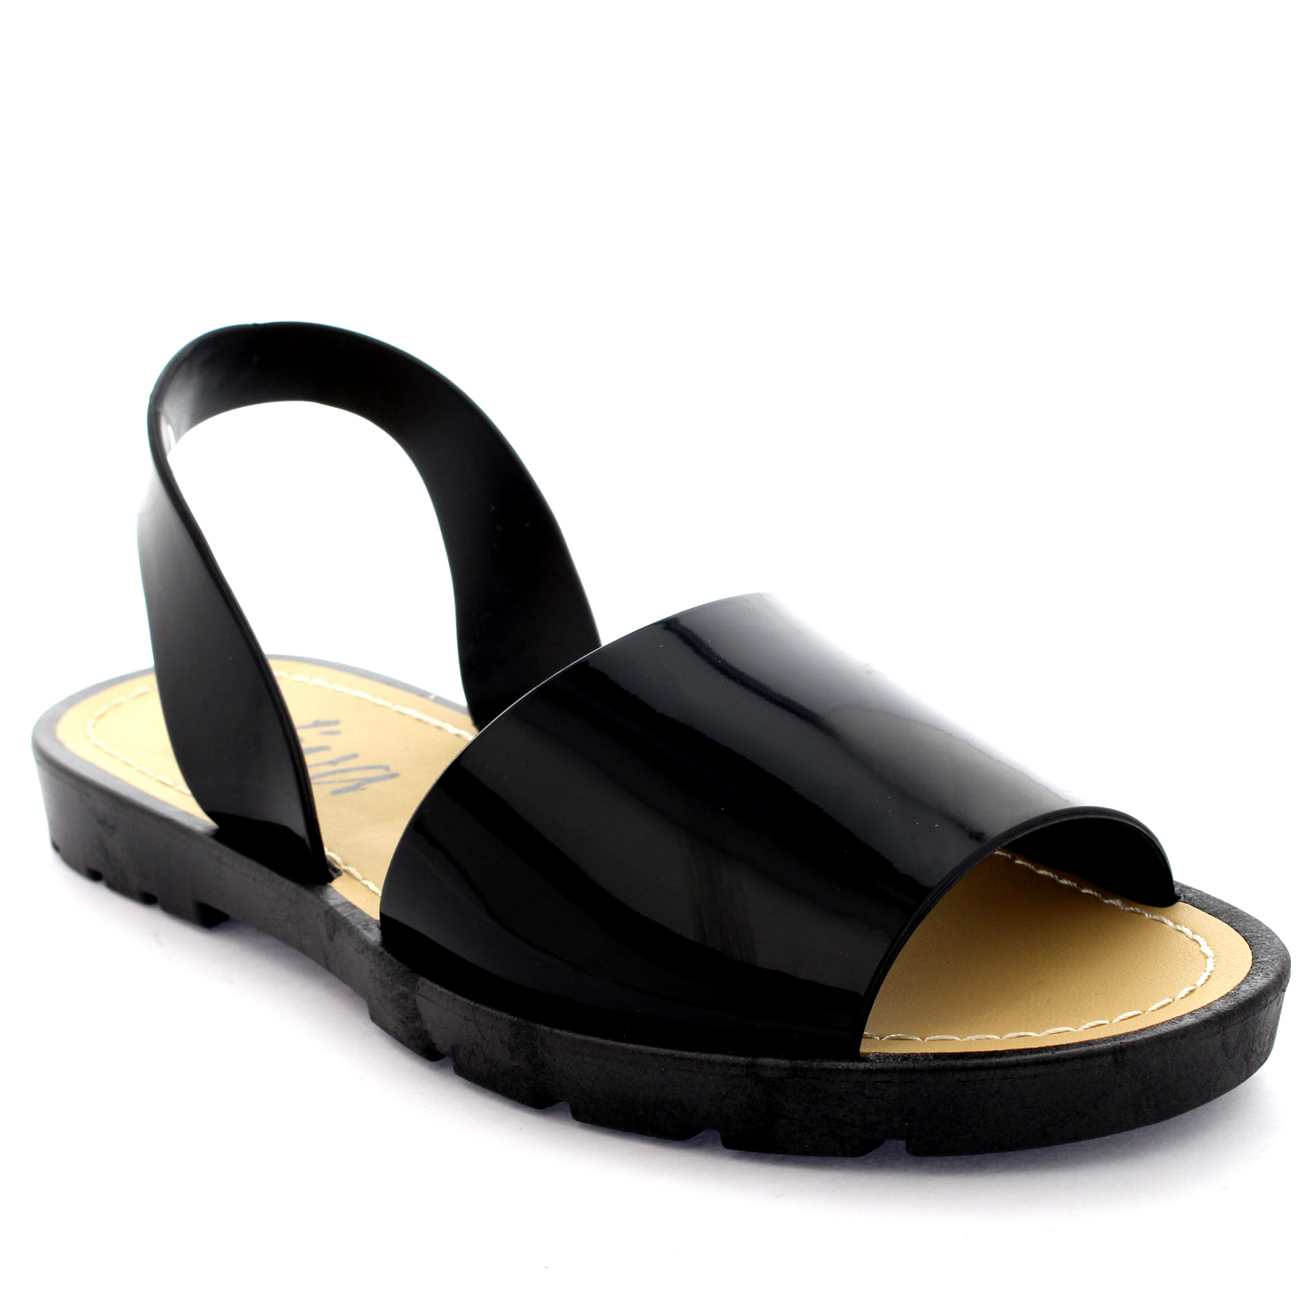 Womens Sling Back Peep Toe Sliders Flip Flops Festival Flatform Sandals UK 3-9